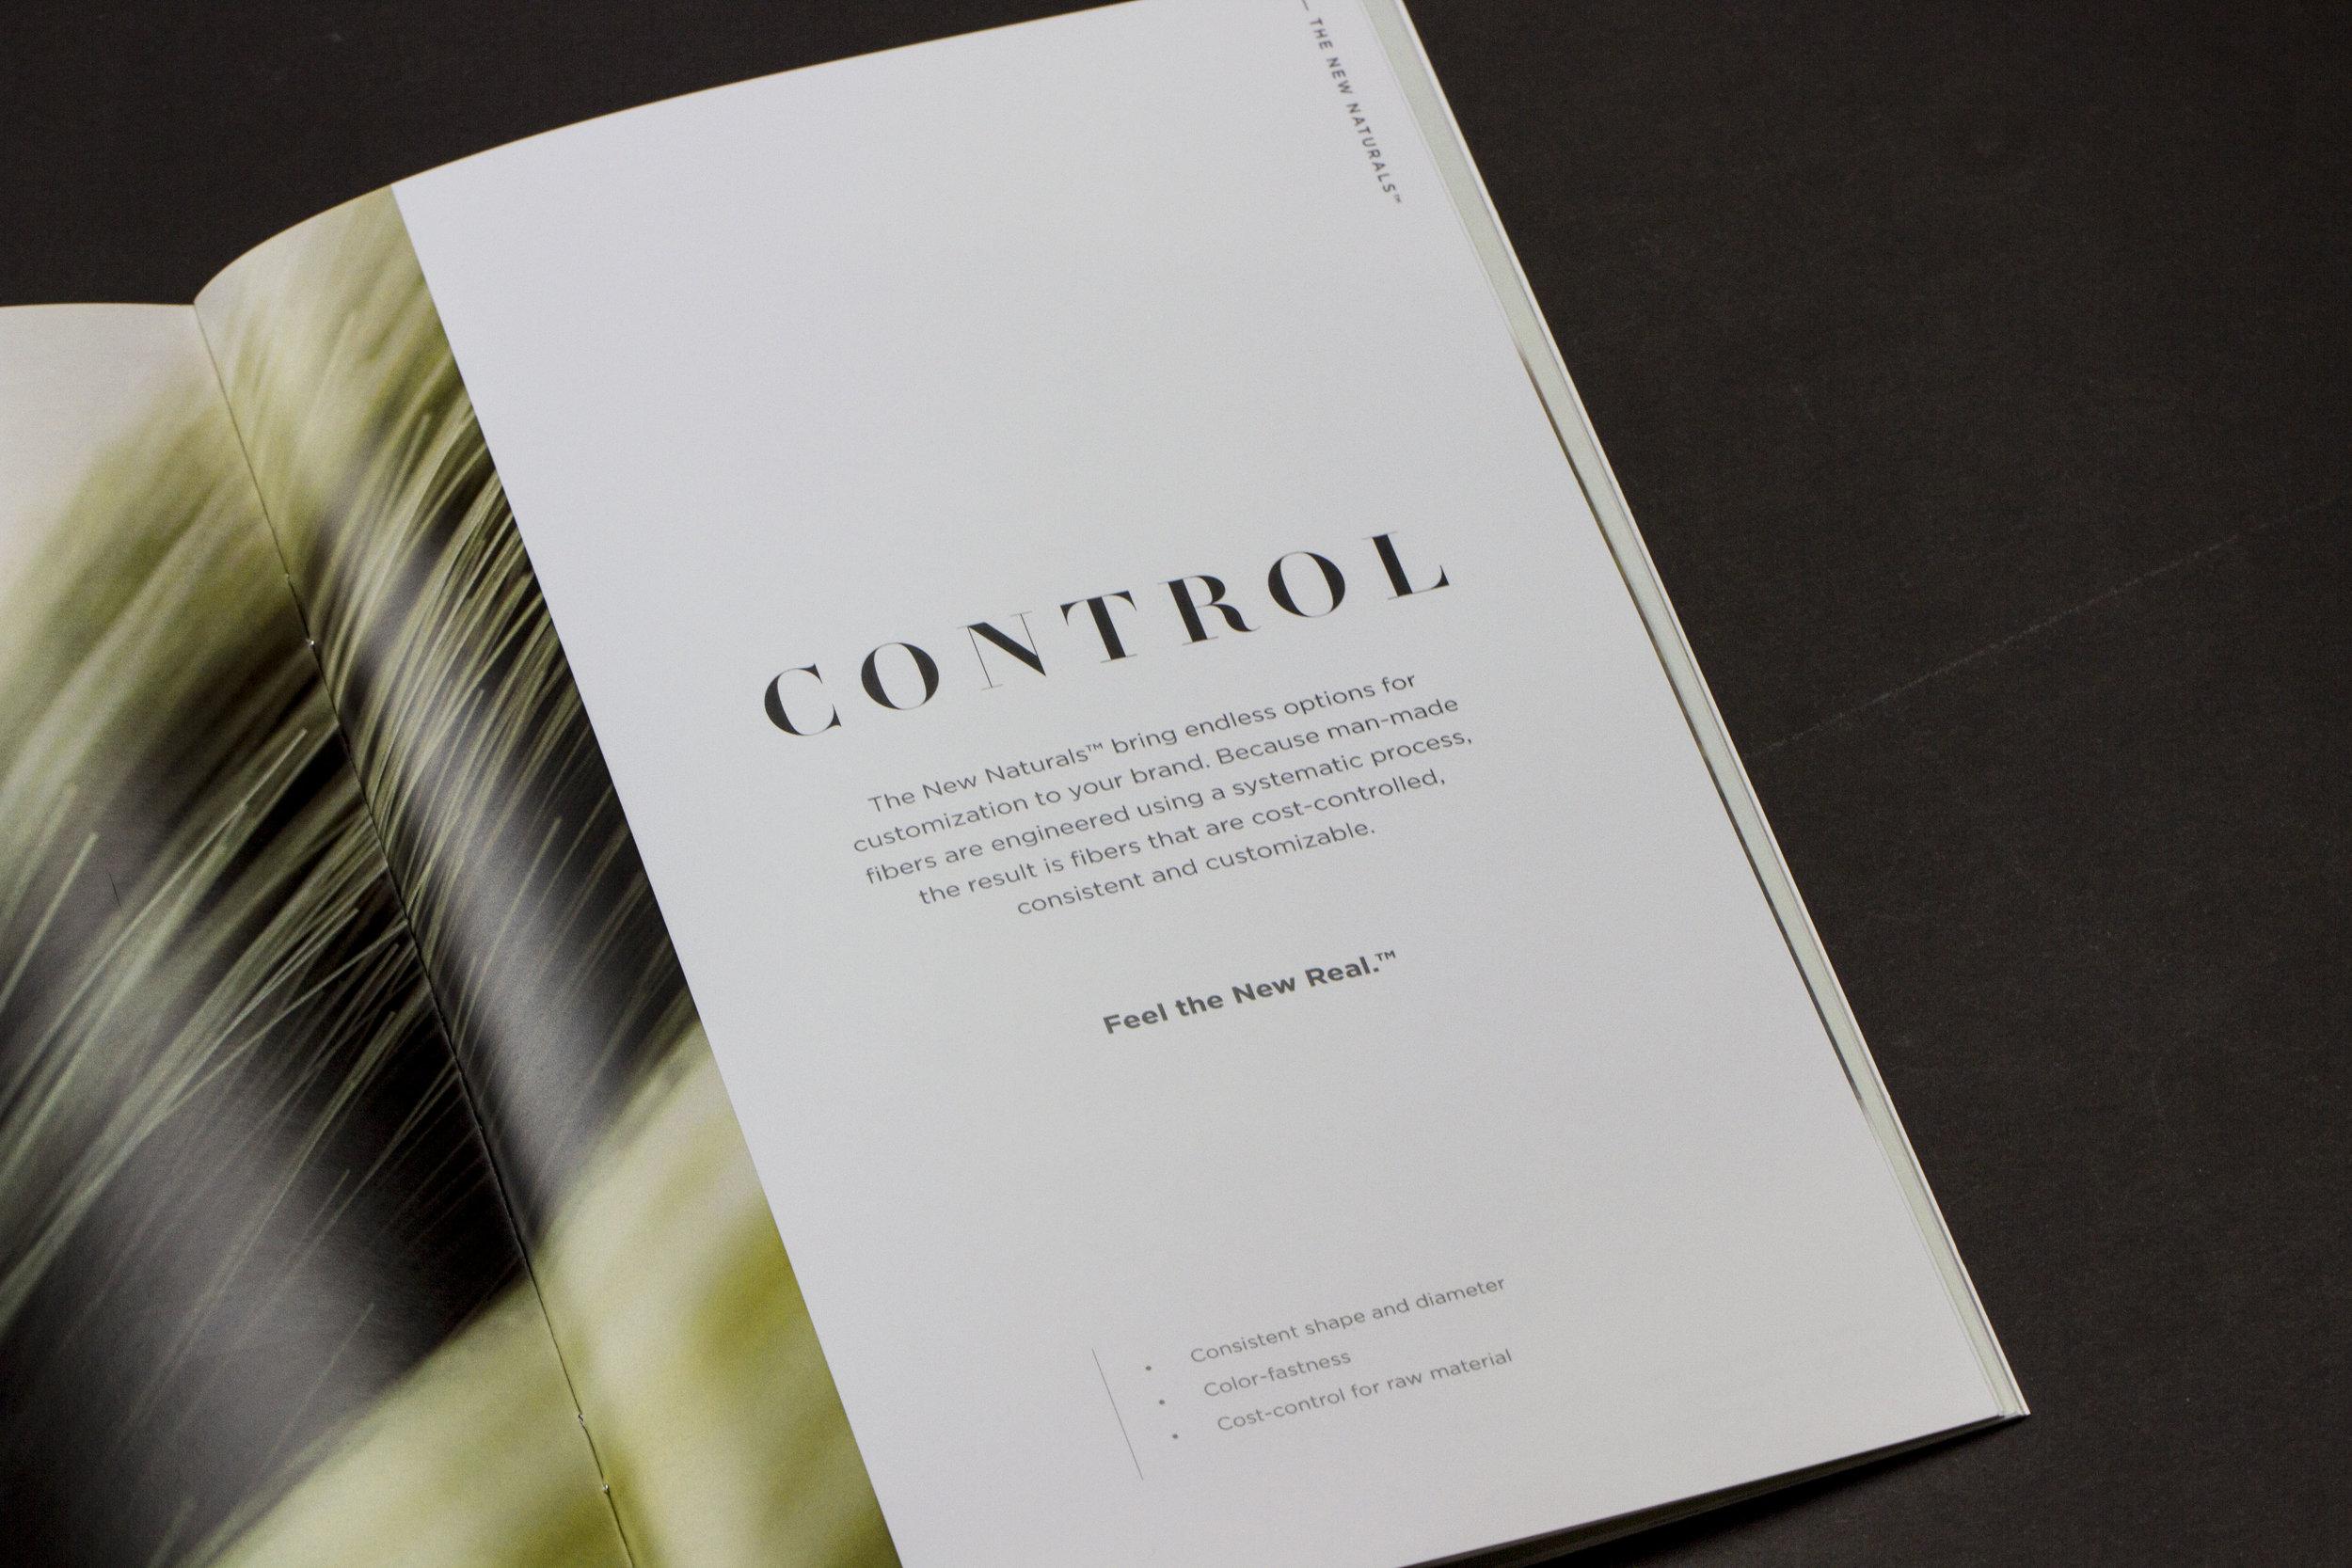 New Naturals Booklet-095.JPG